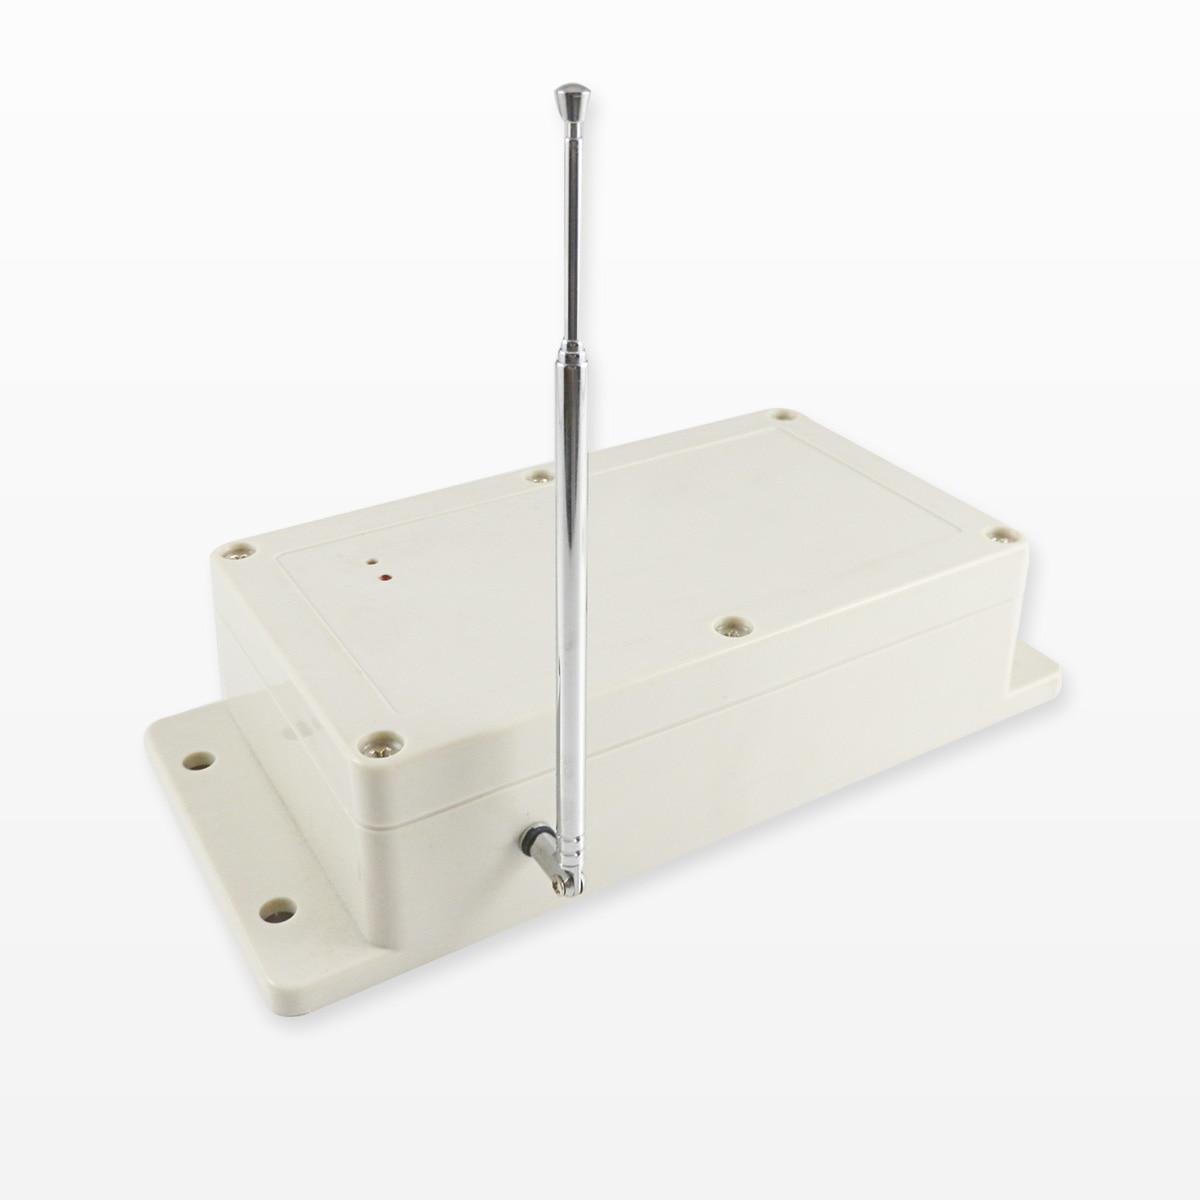 Wireless Signal Extender Household Wireless Alarm Burglar Alarm Signal Enhanced YSQ001 цена